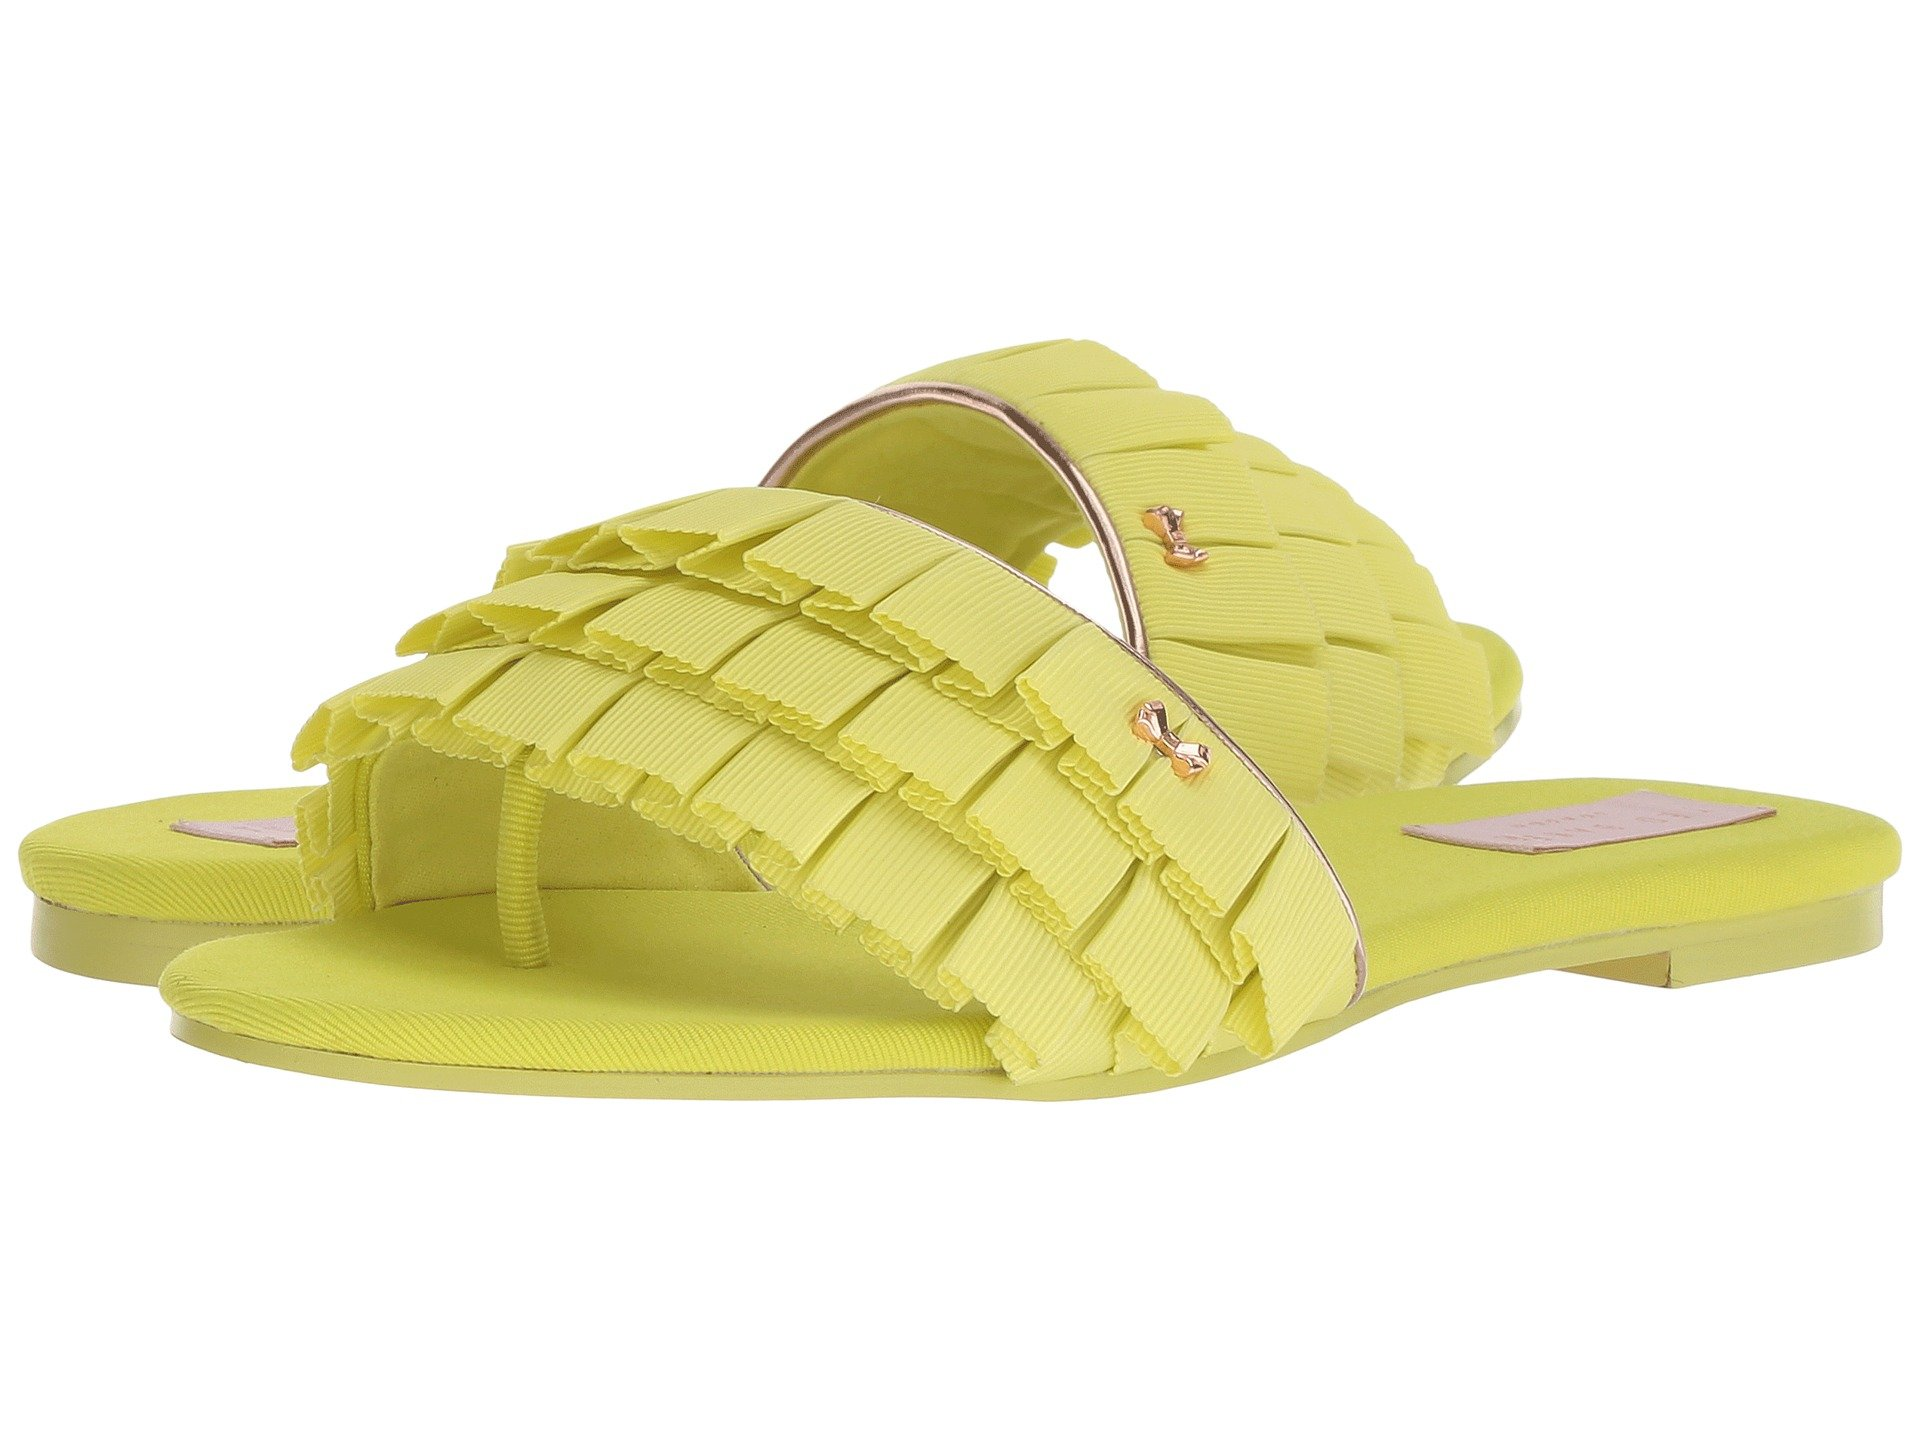 Ted Baker Women's Towdi Slides Sandals Shoes